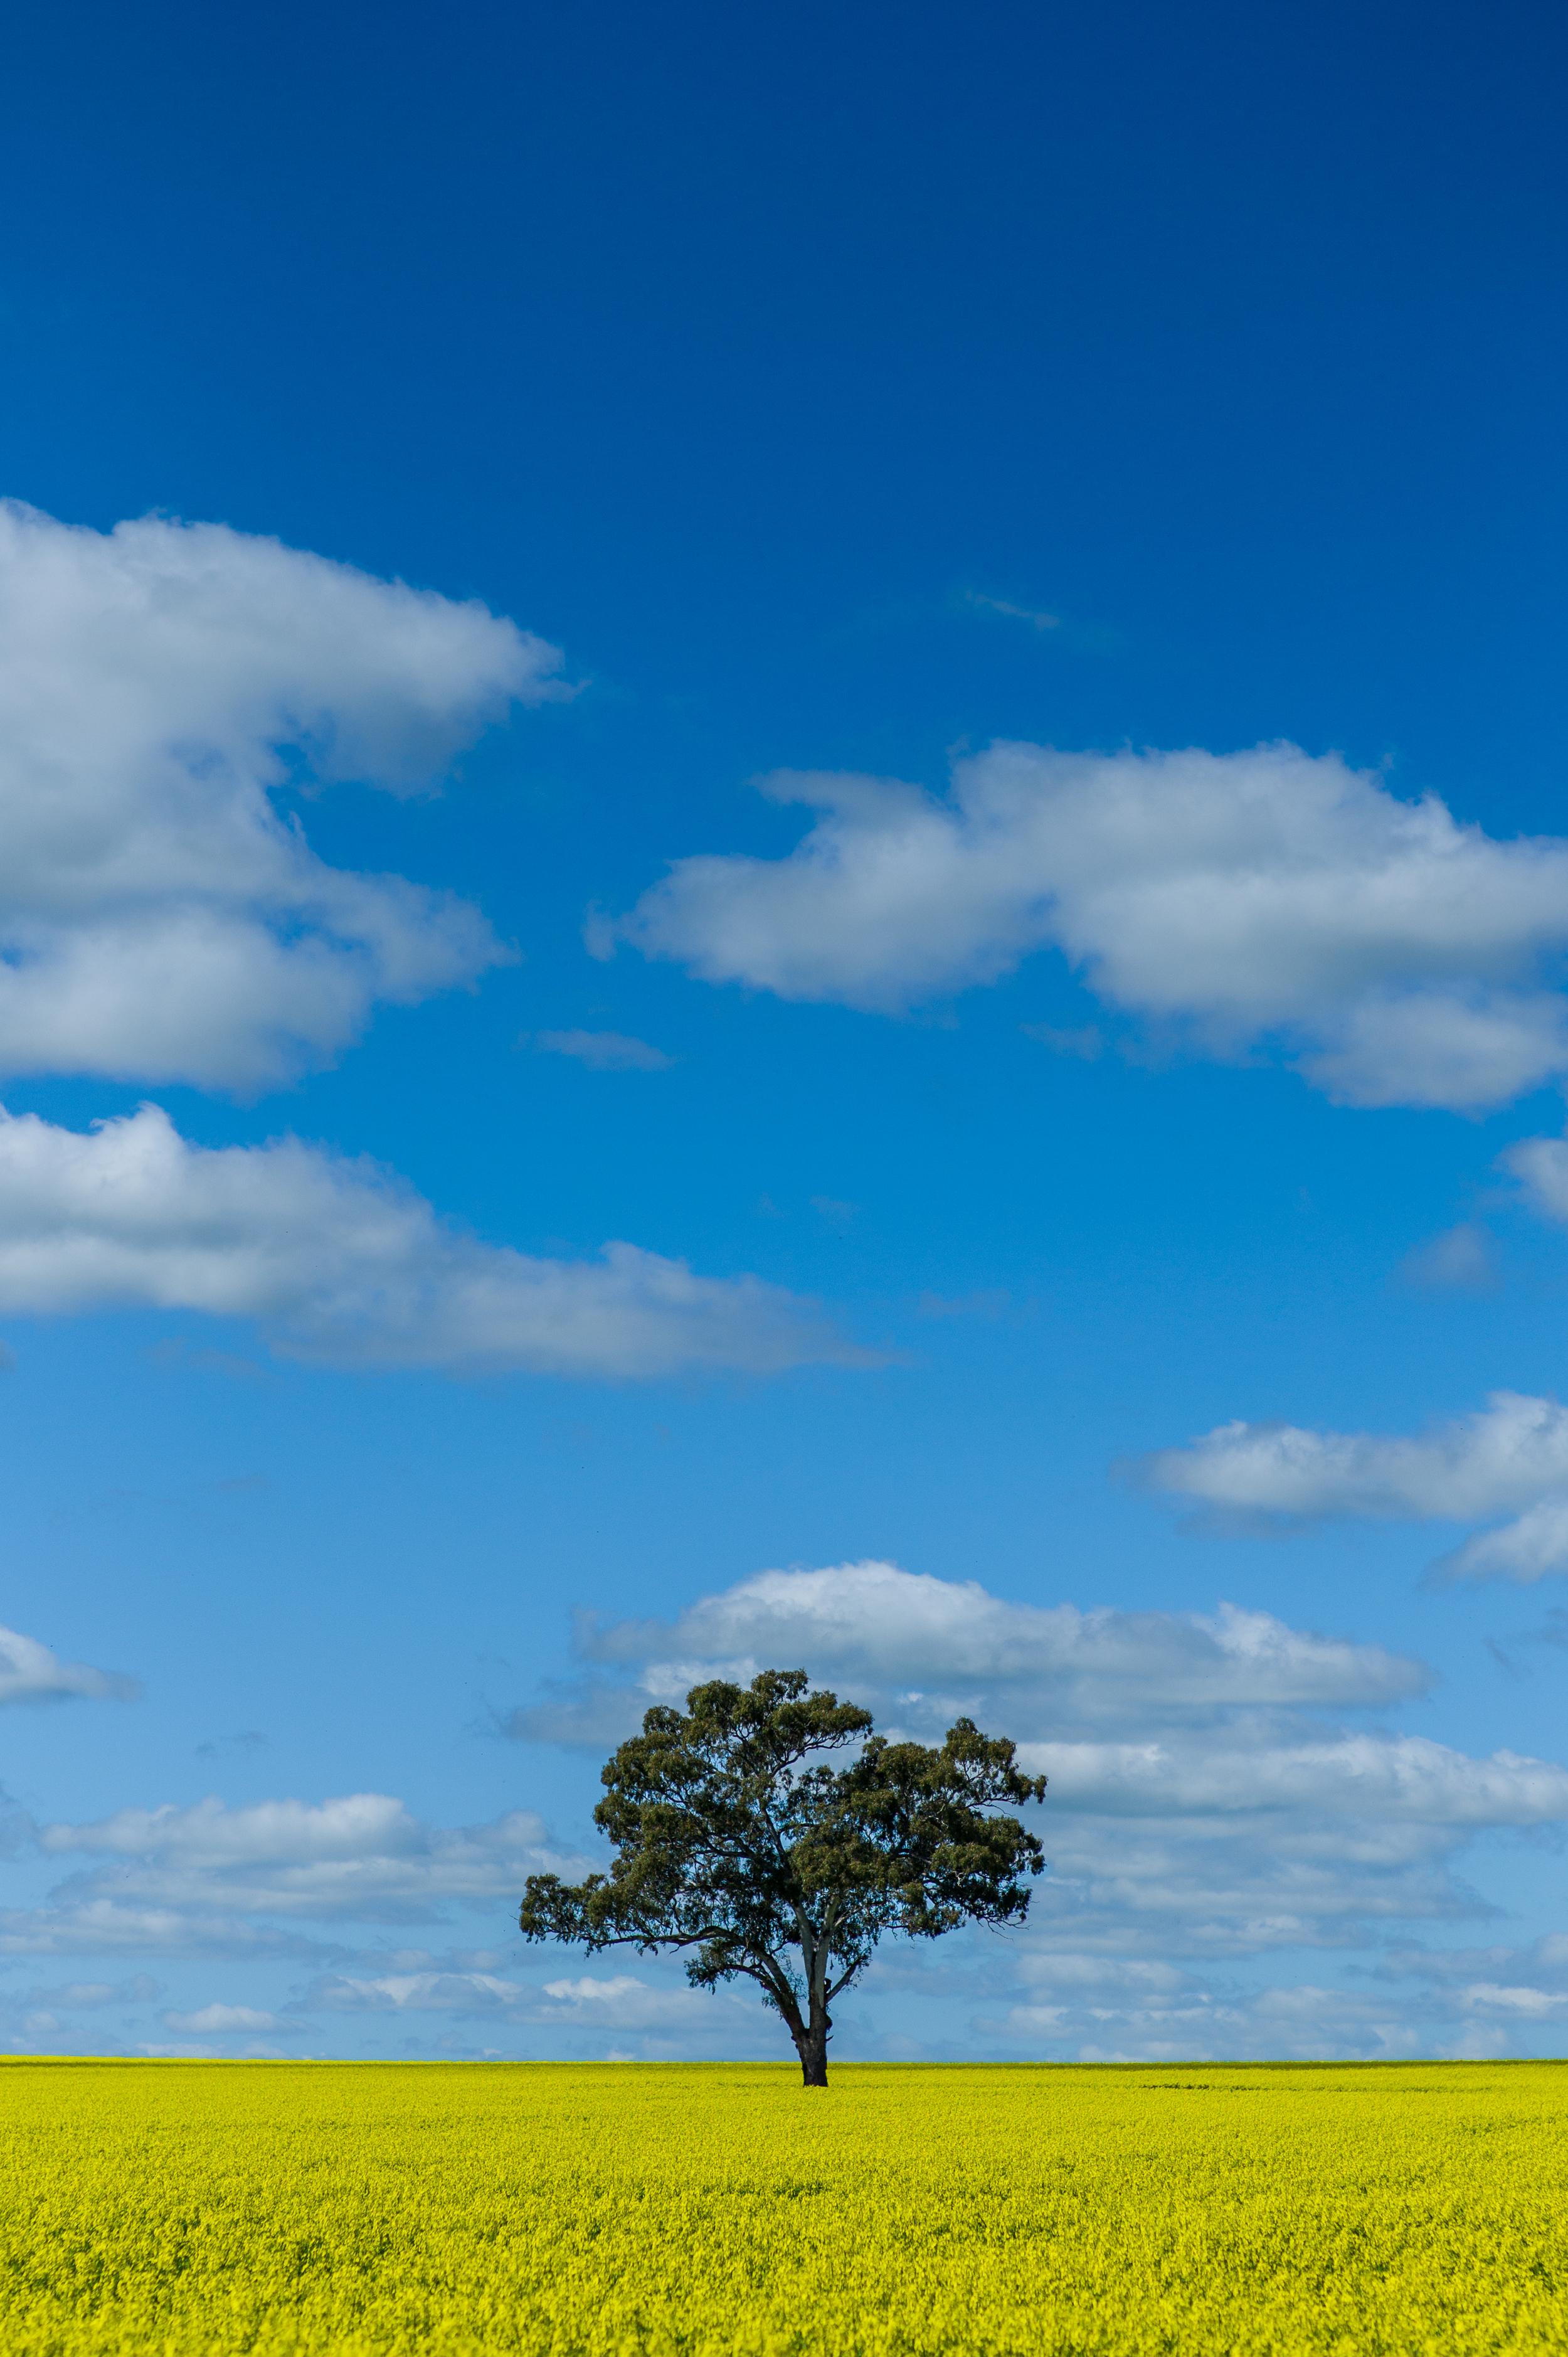 Lone Tree in a Field of Canola